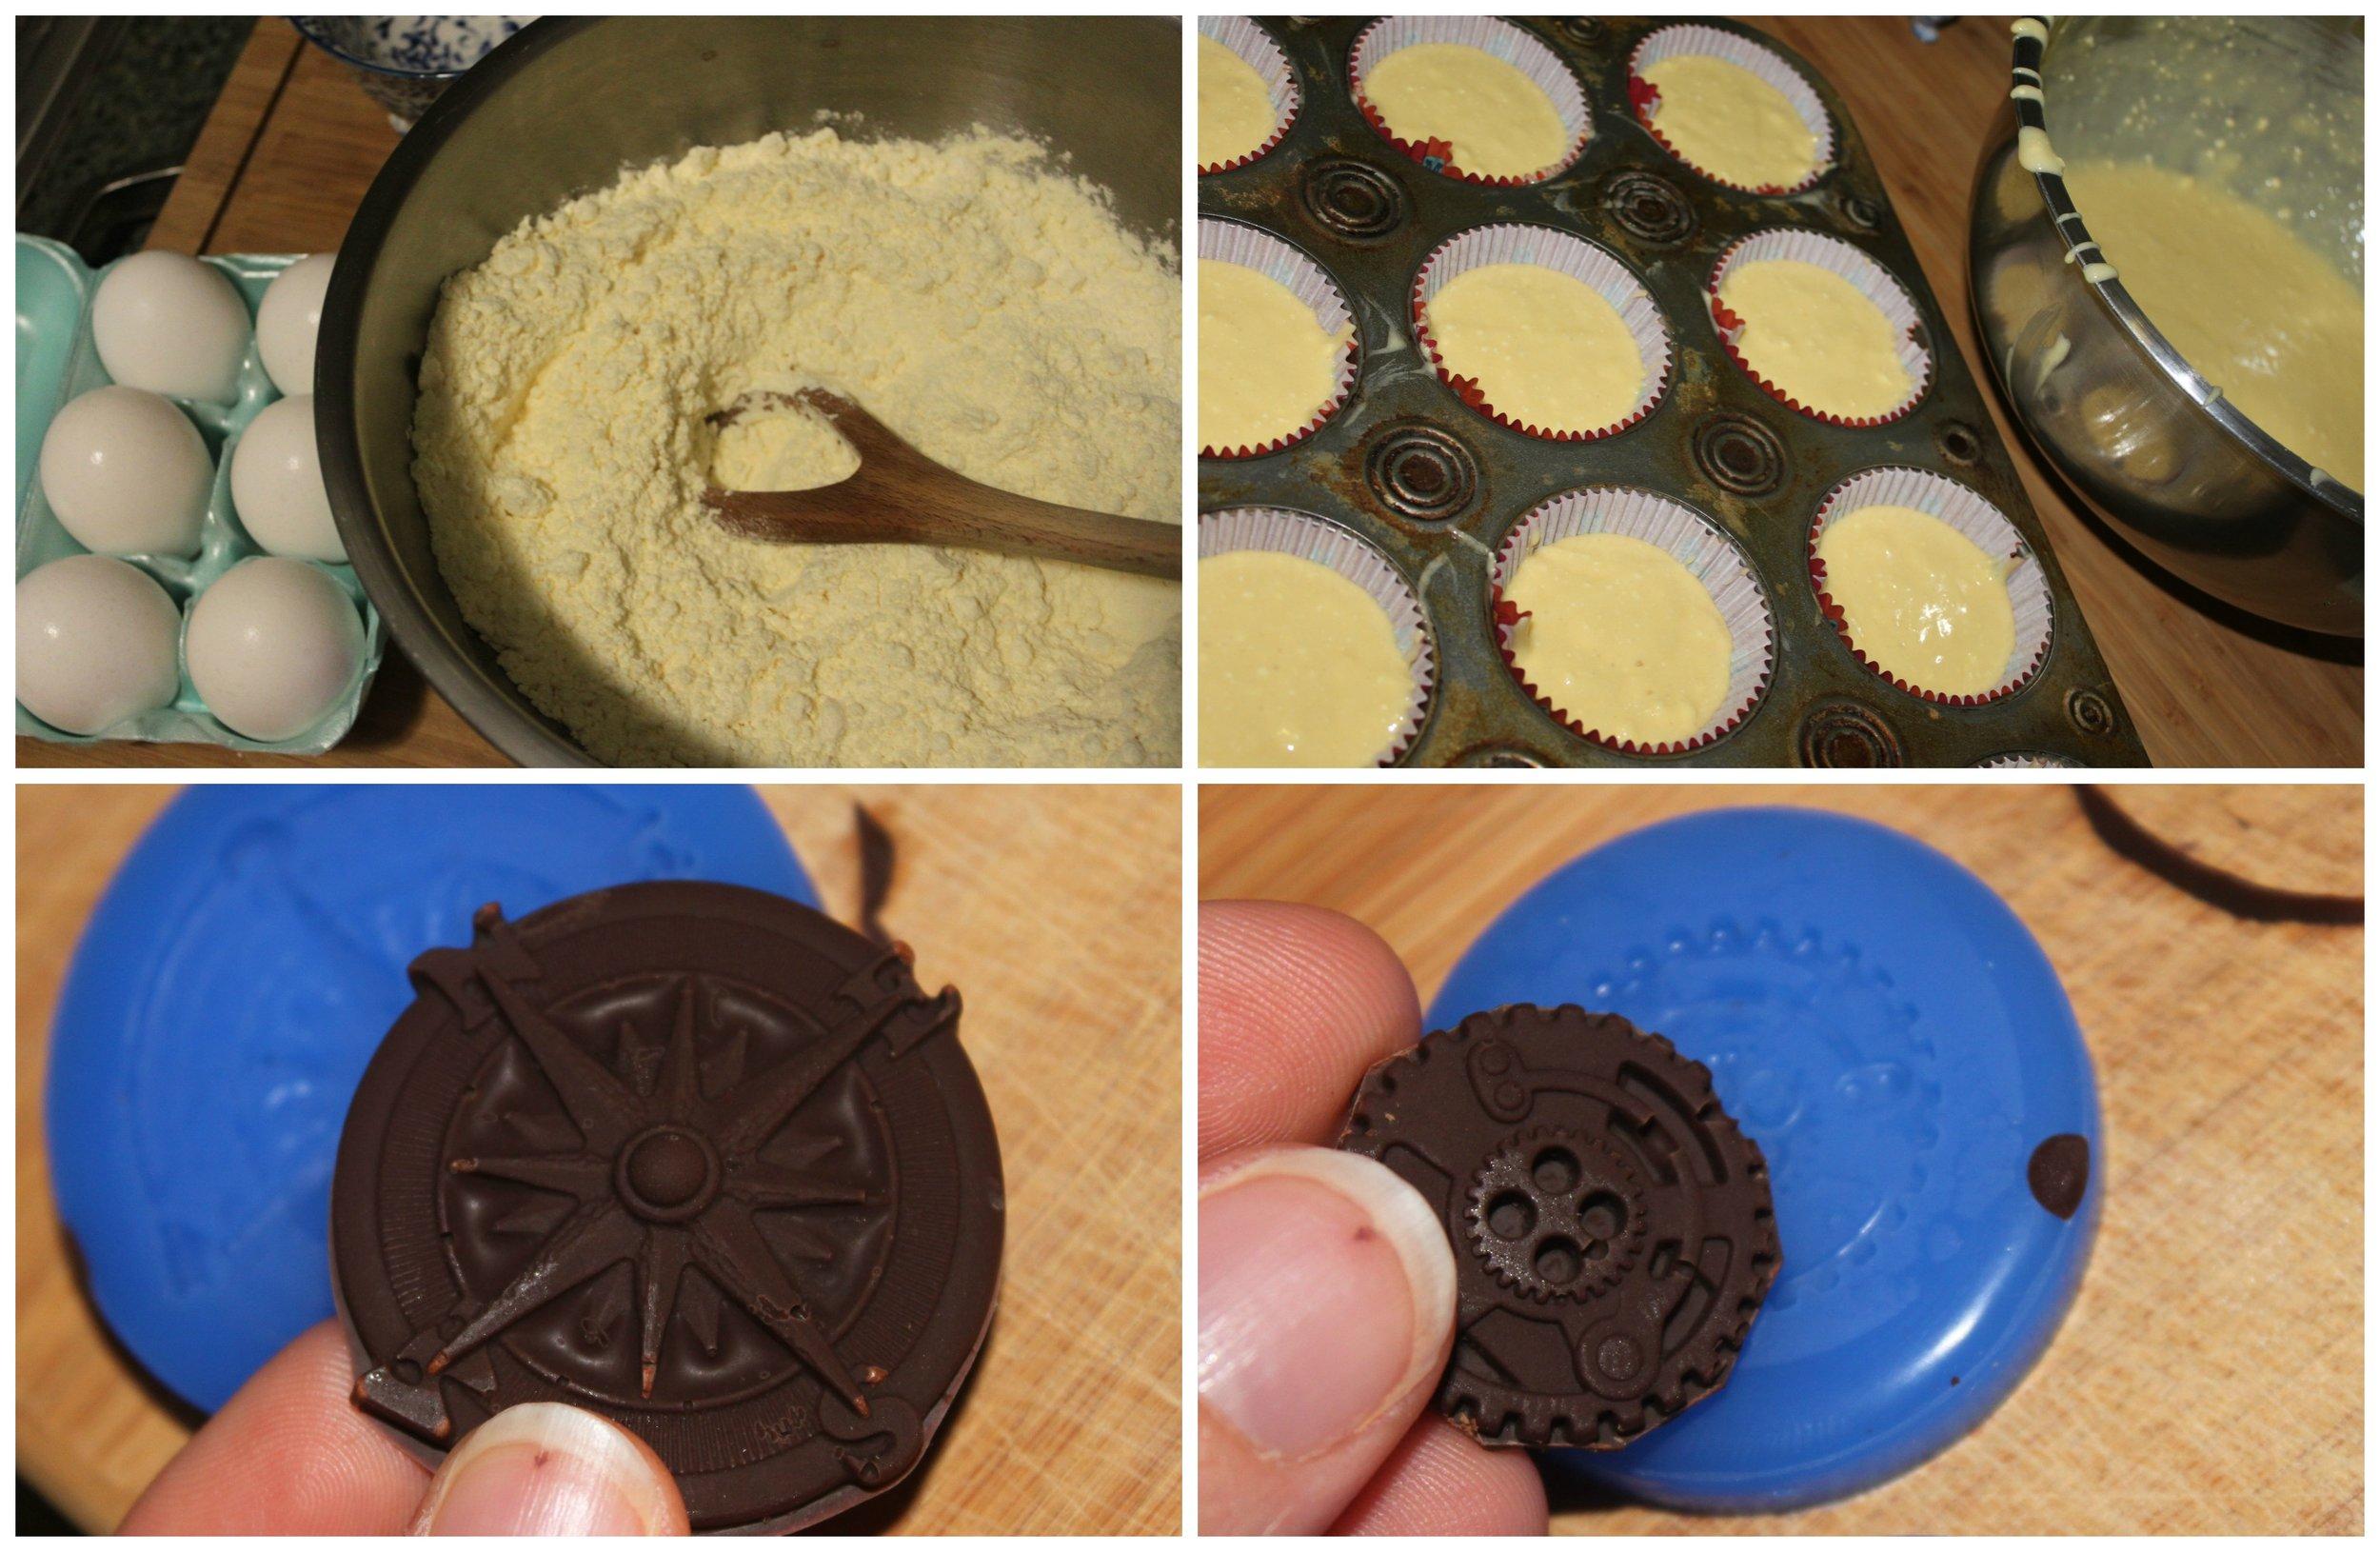 Steampunk Cupcake 1